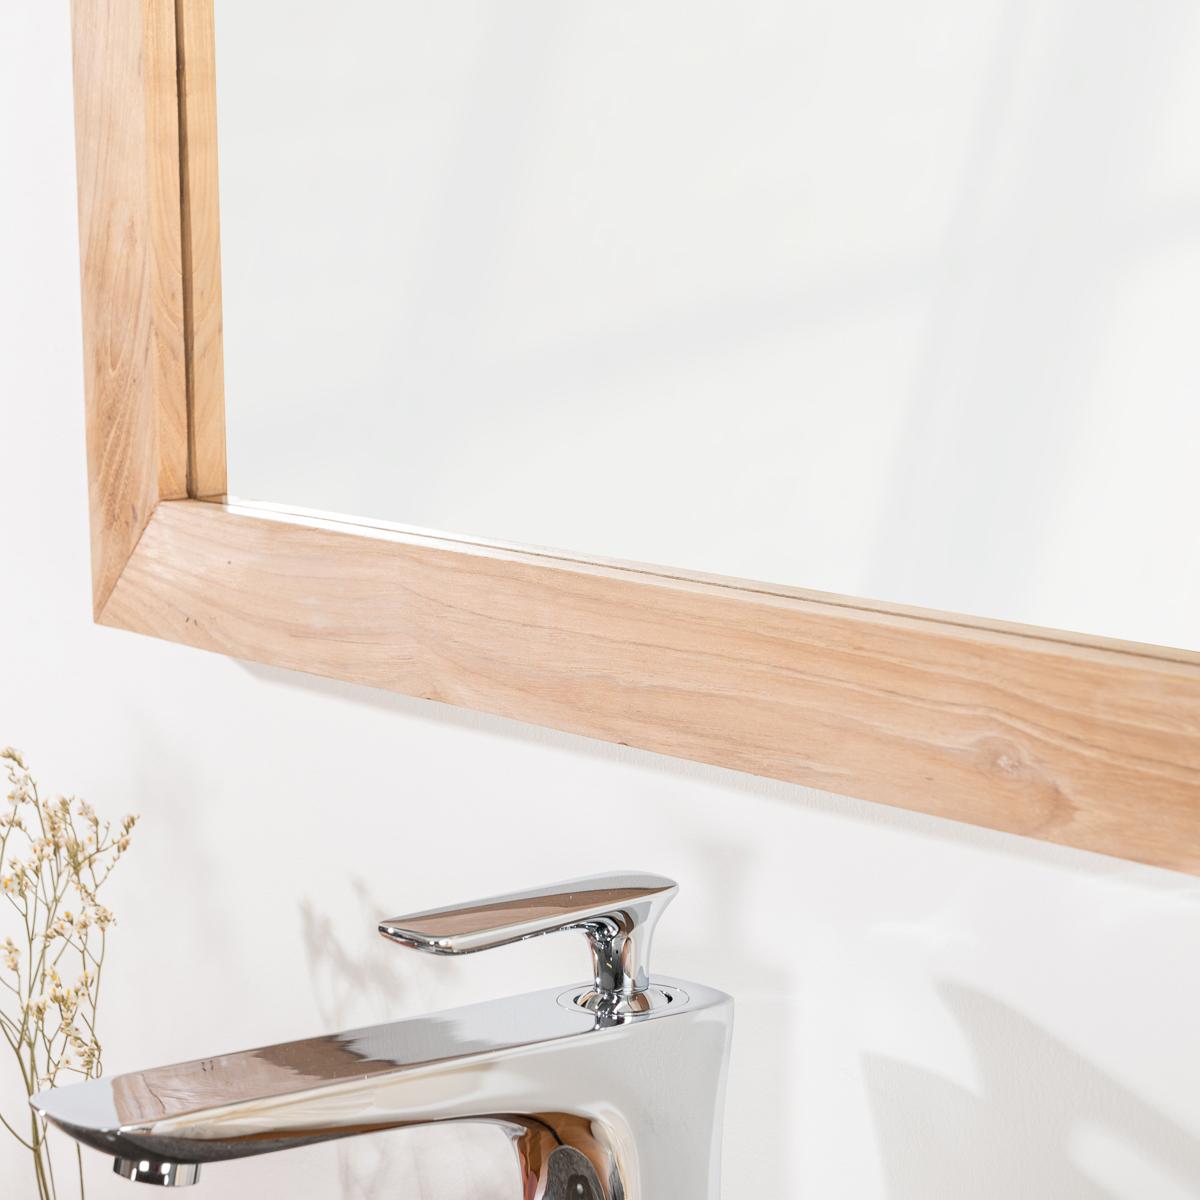 Miroir de salle de bain en bois teck massif nature for Salle de bain en teck massif